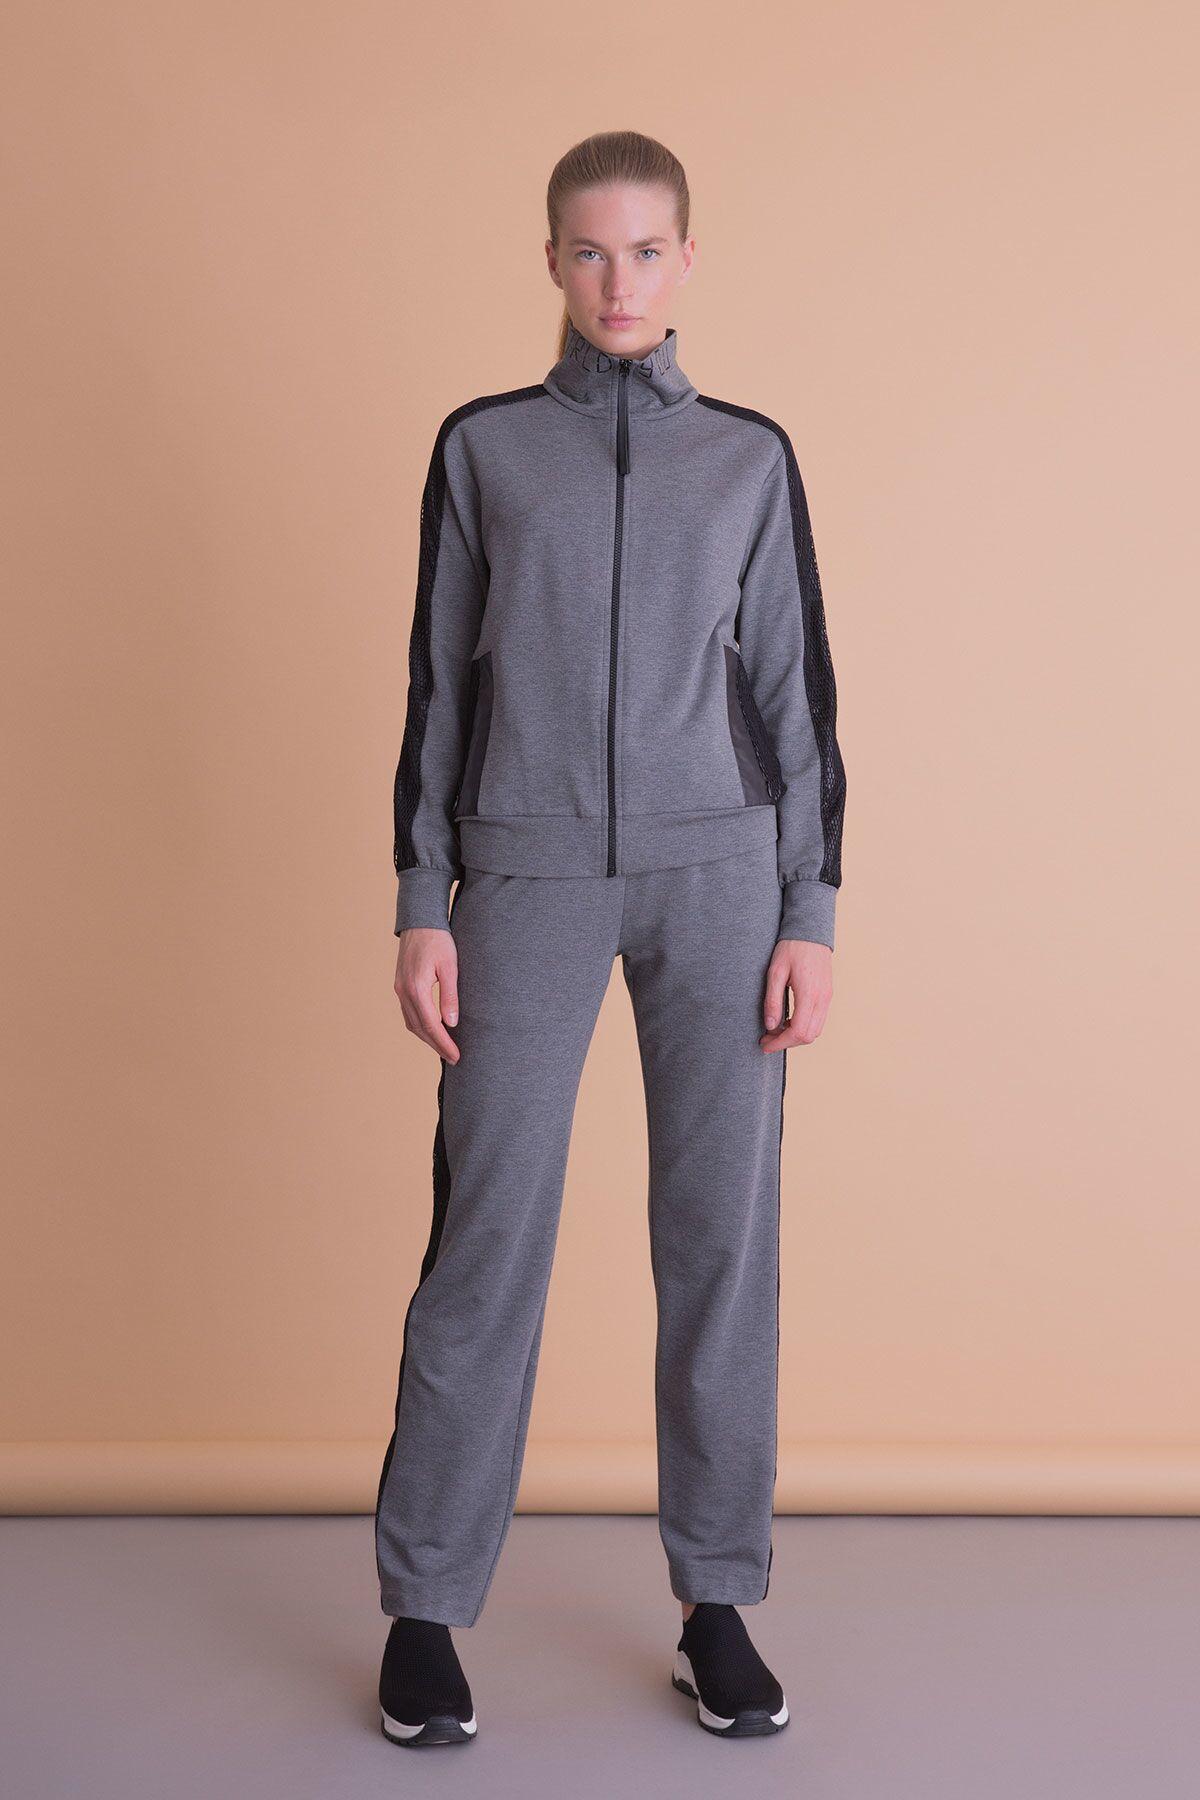 Siyah File Detaylı Antrasit Gri Fermuarlı Sweatshirt